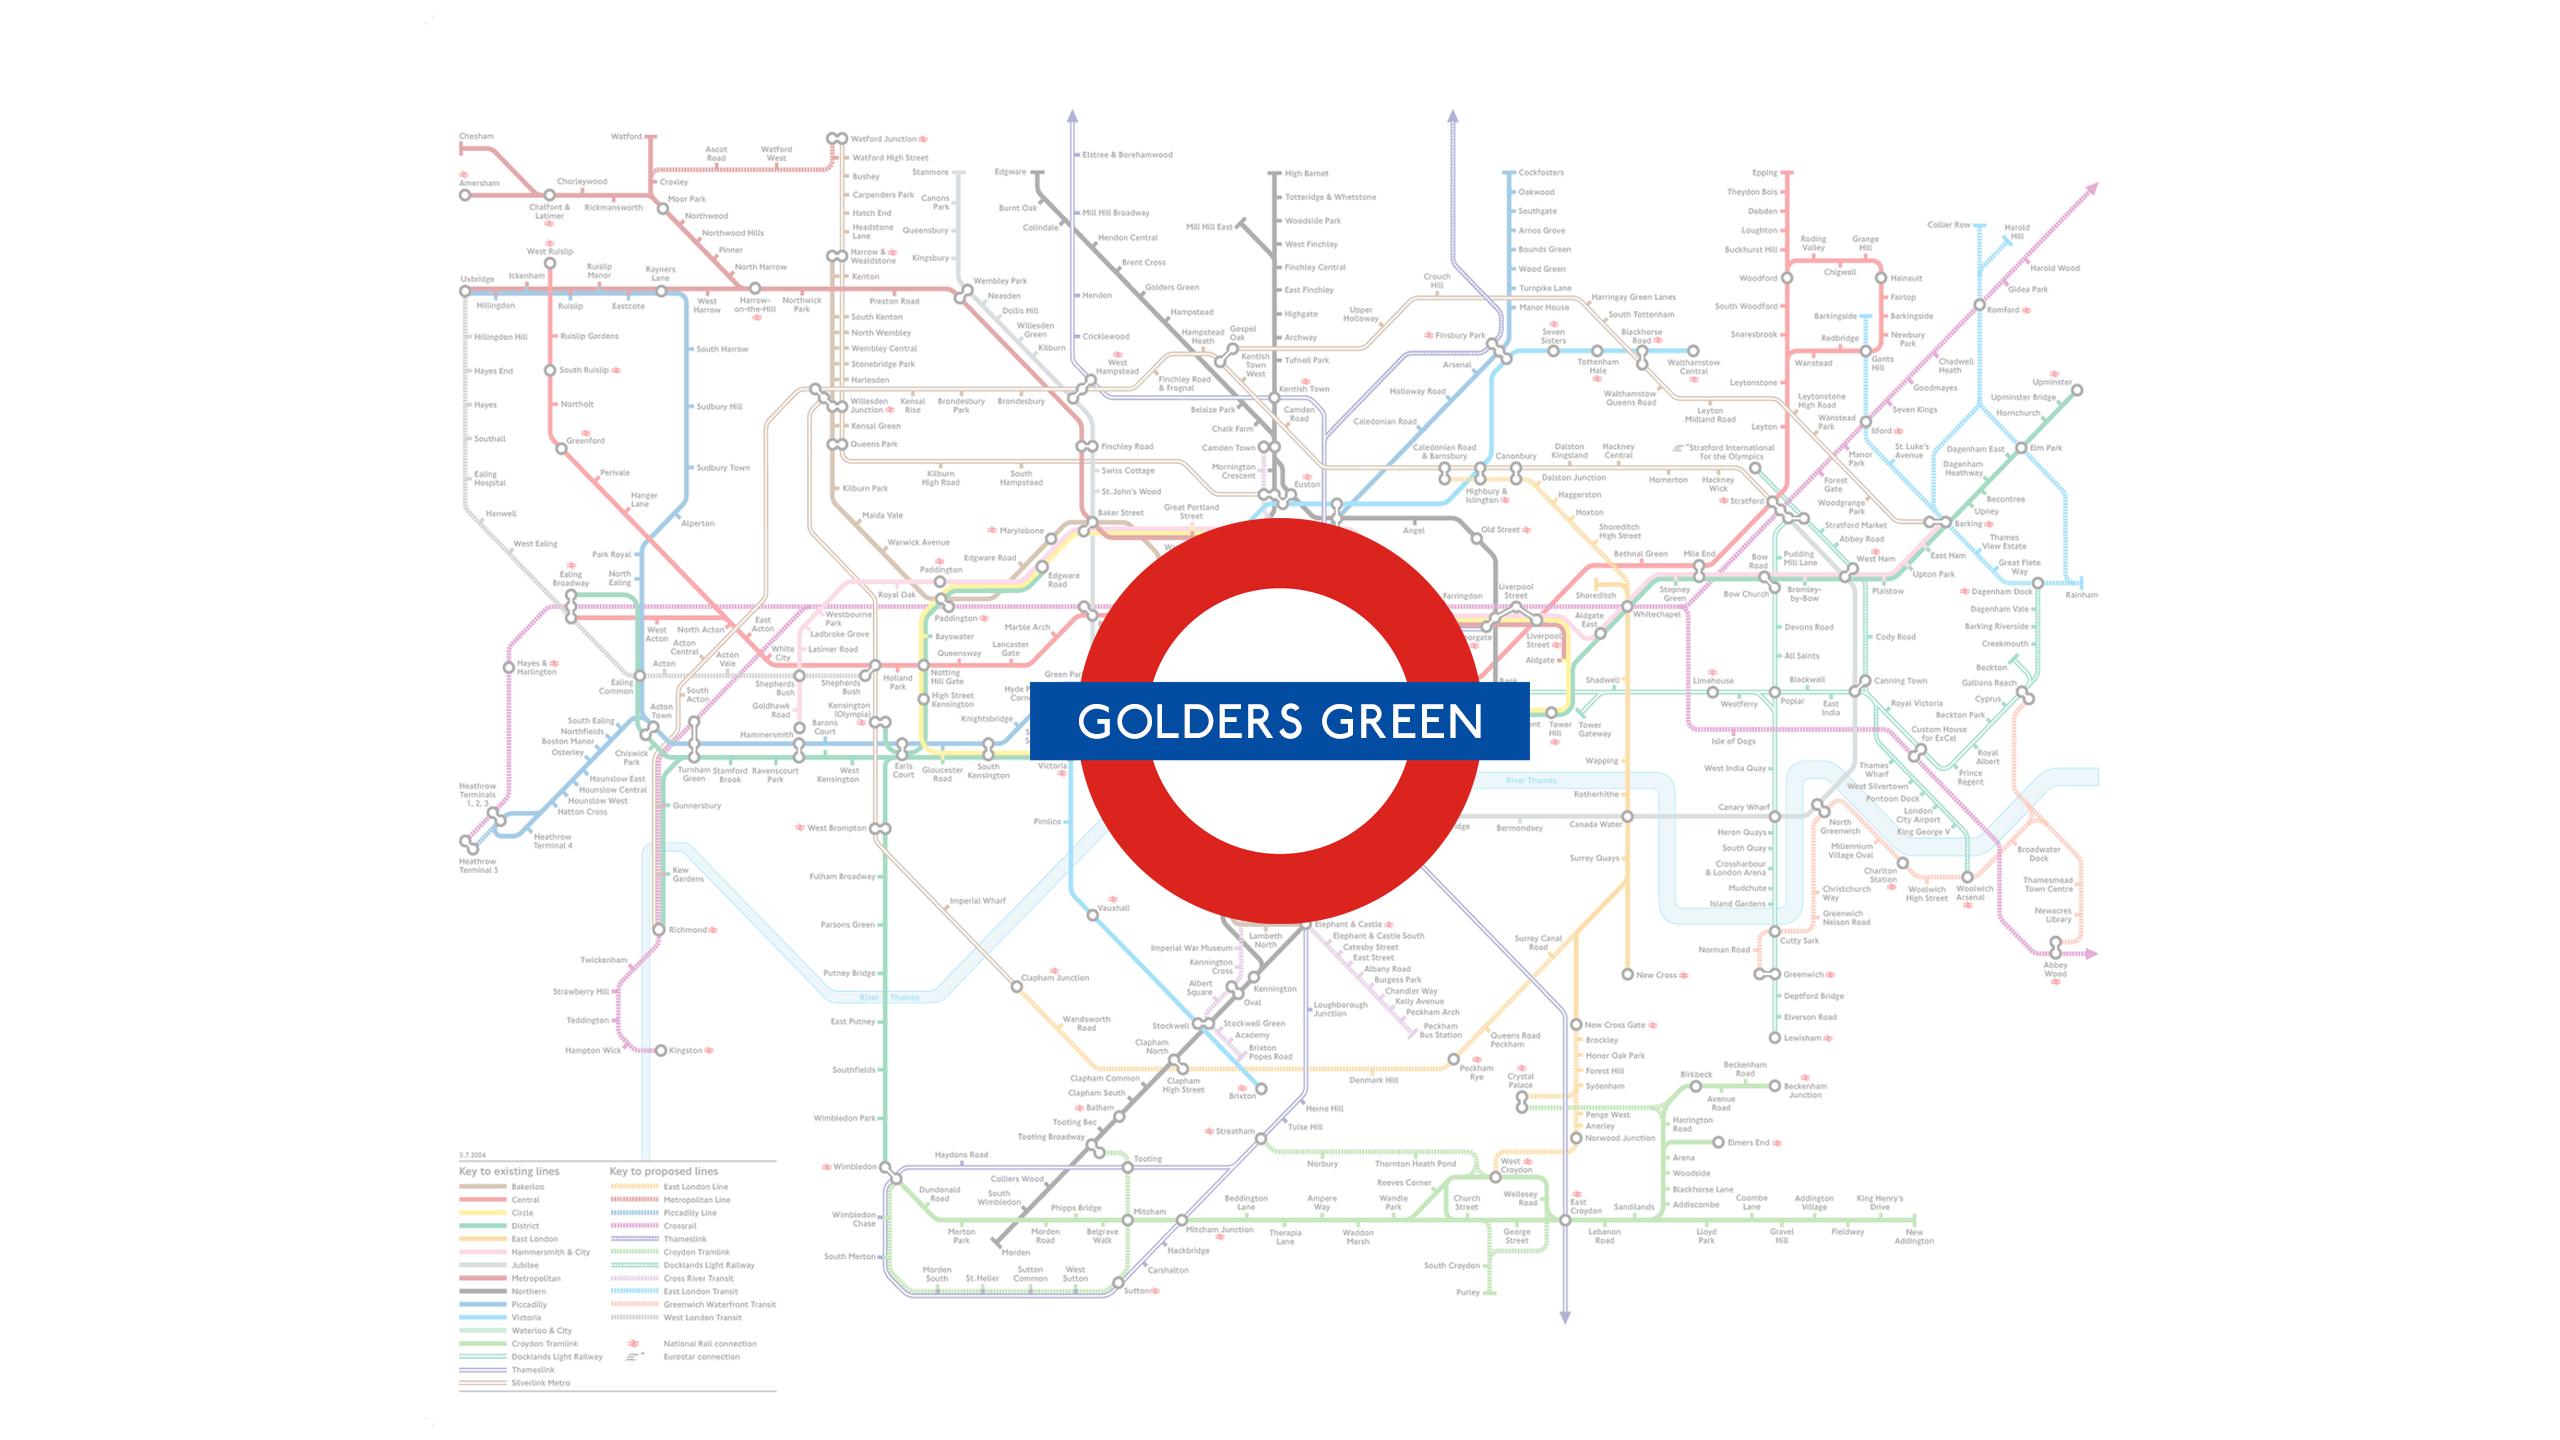 Golders Green (Map)